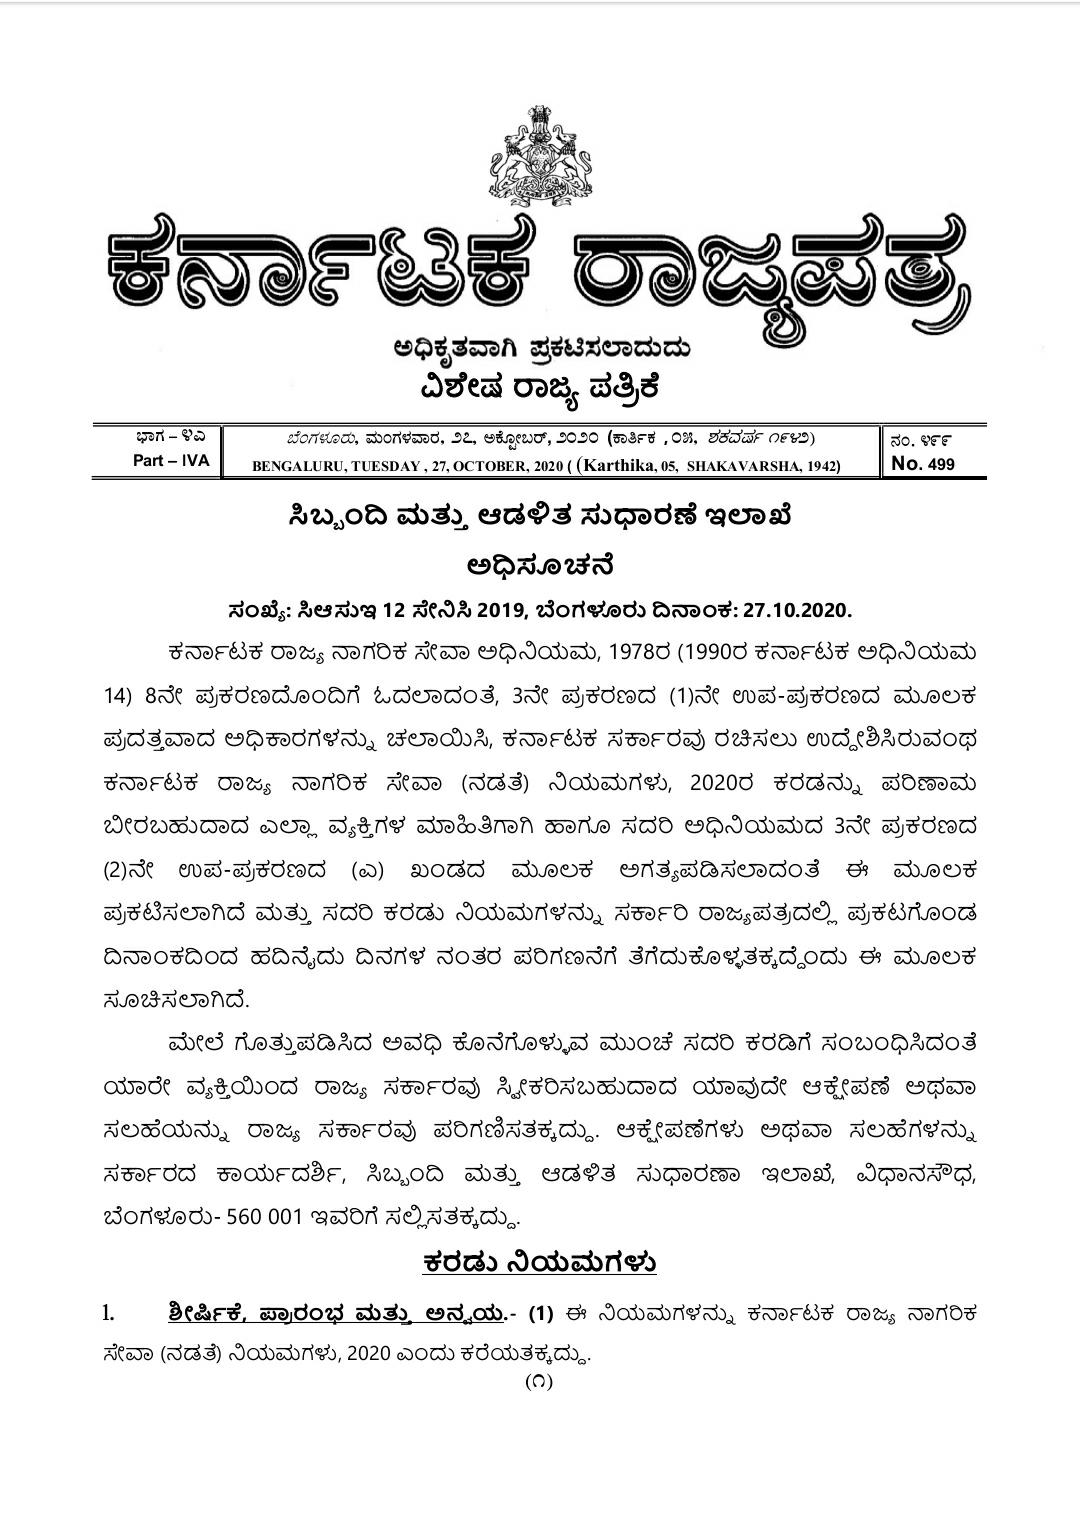 Karnataka State Civil Service Regulations, 2020. Date of Issue: 27-10-2020